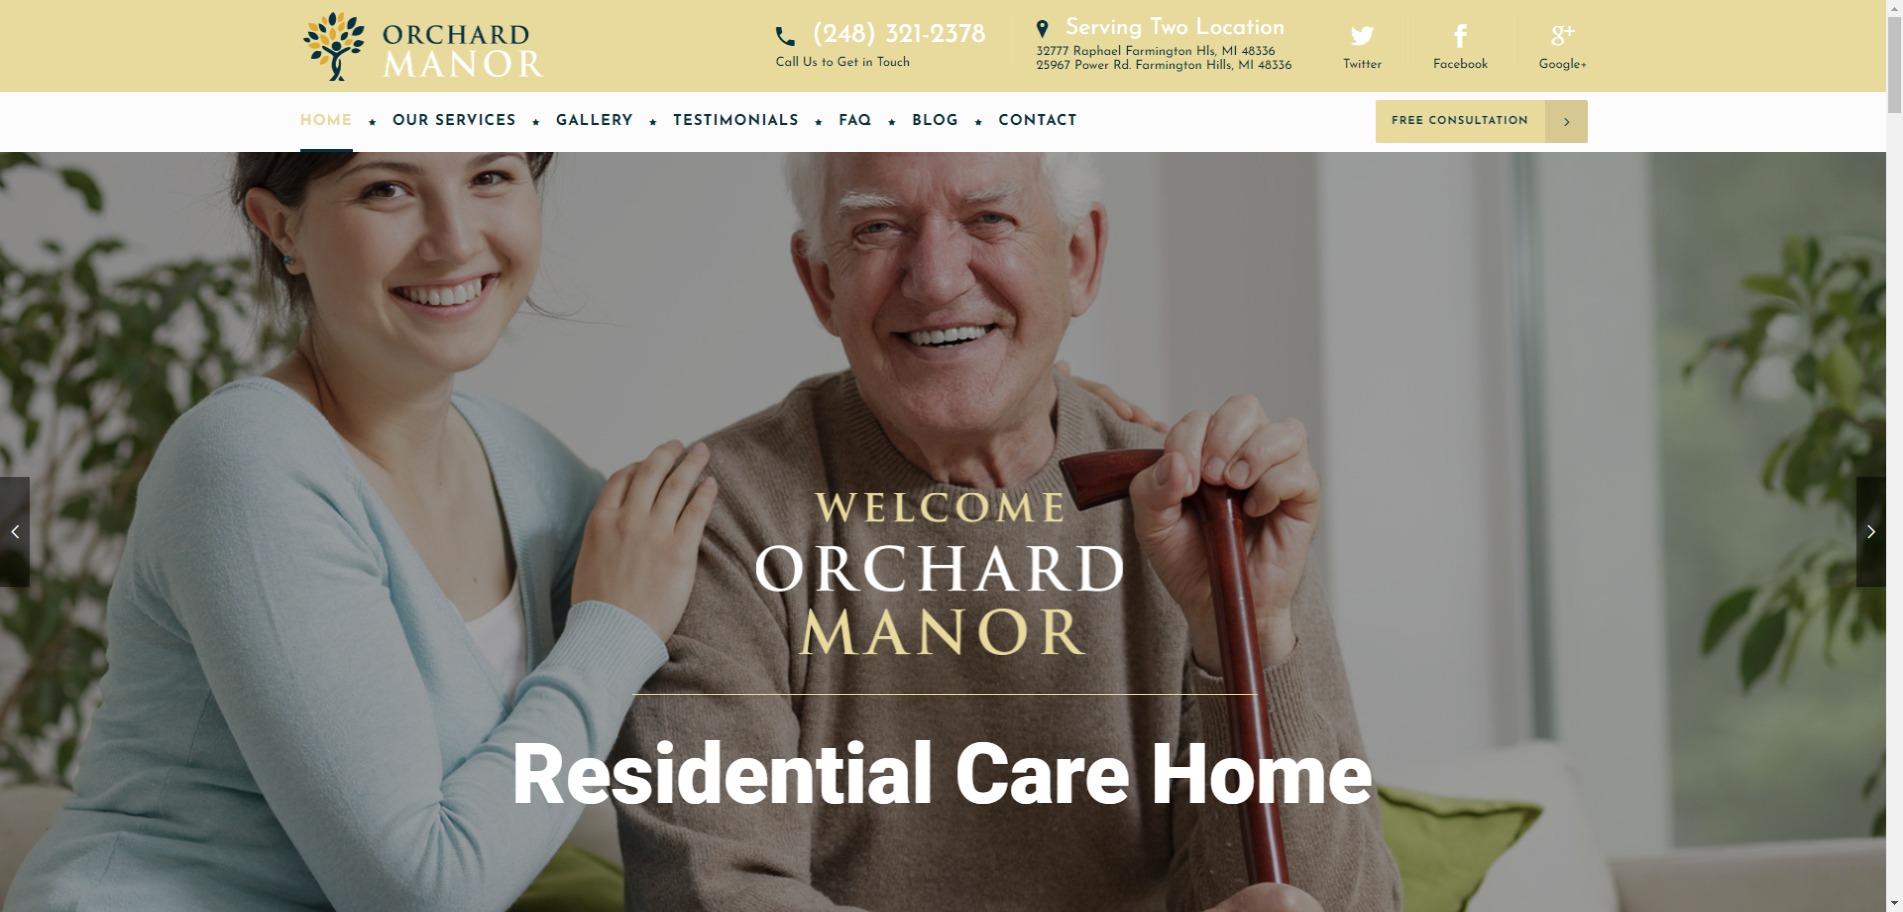 Orchard Manor Offers Unbridled Senior Care in Farmington Hills, MI